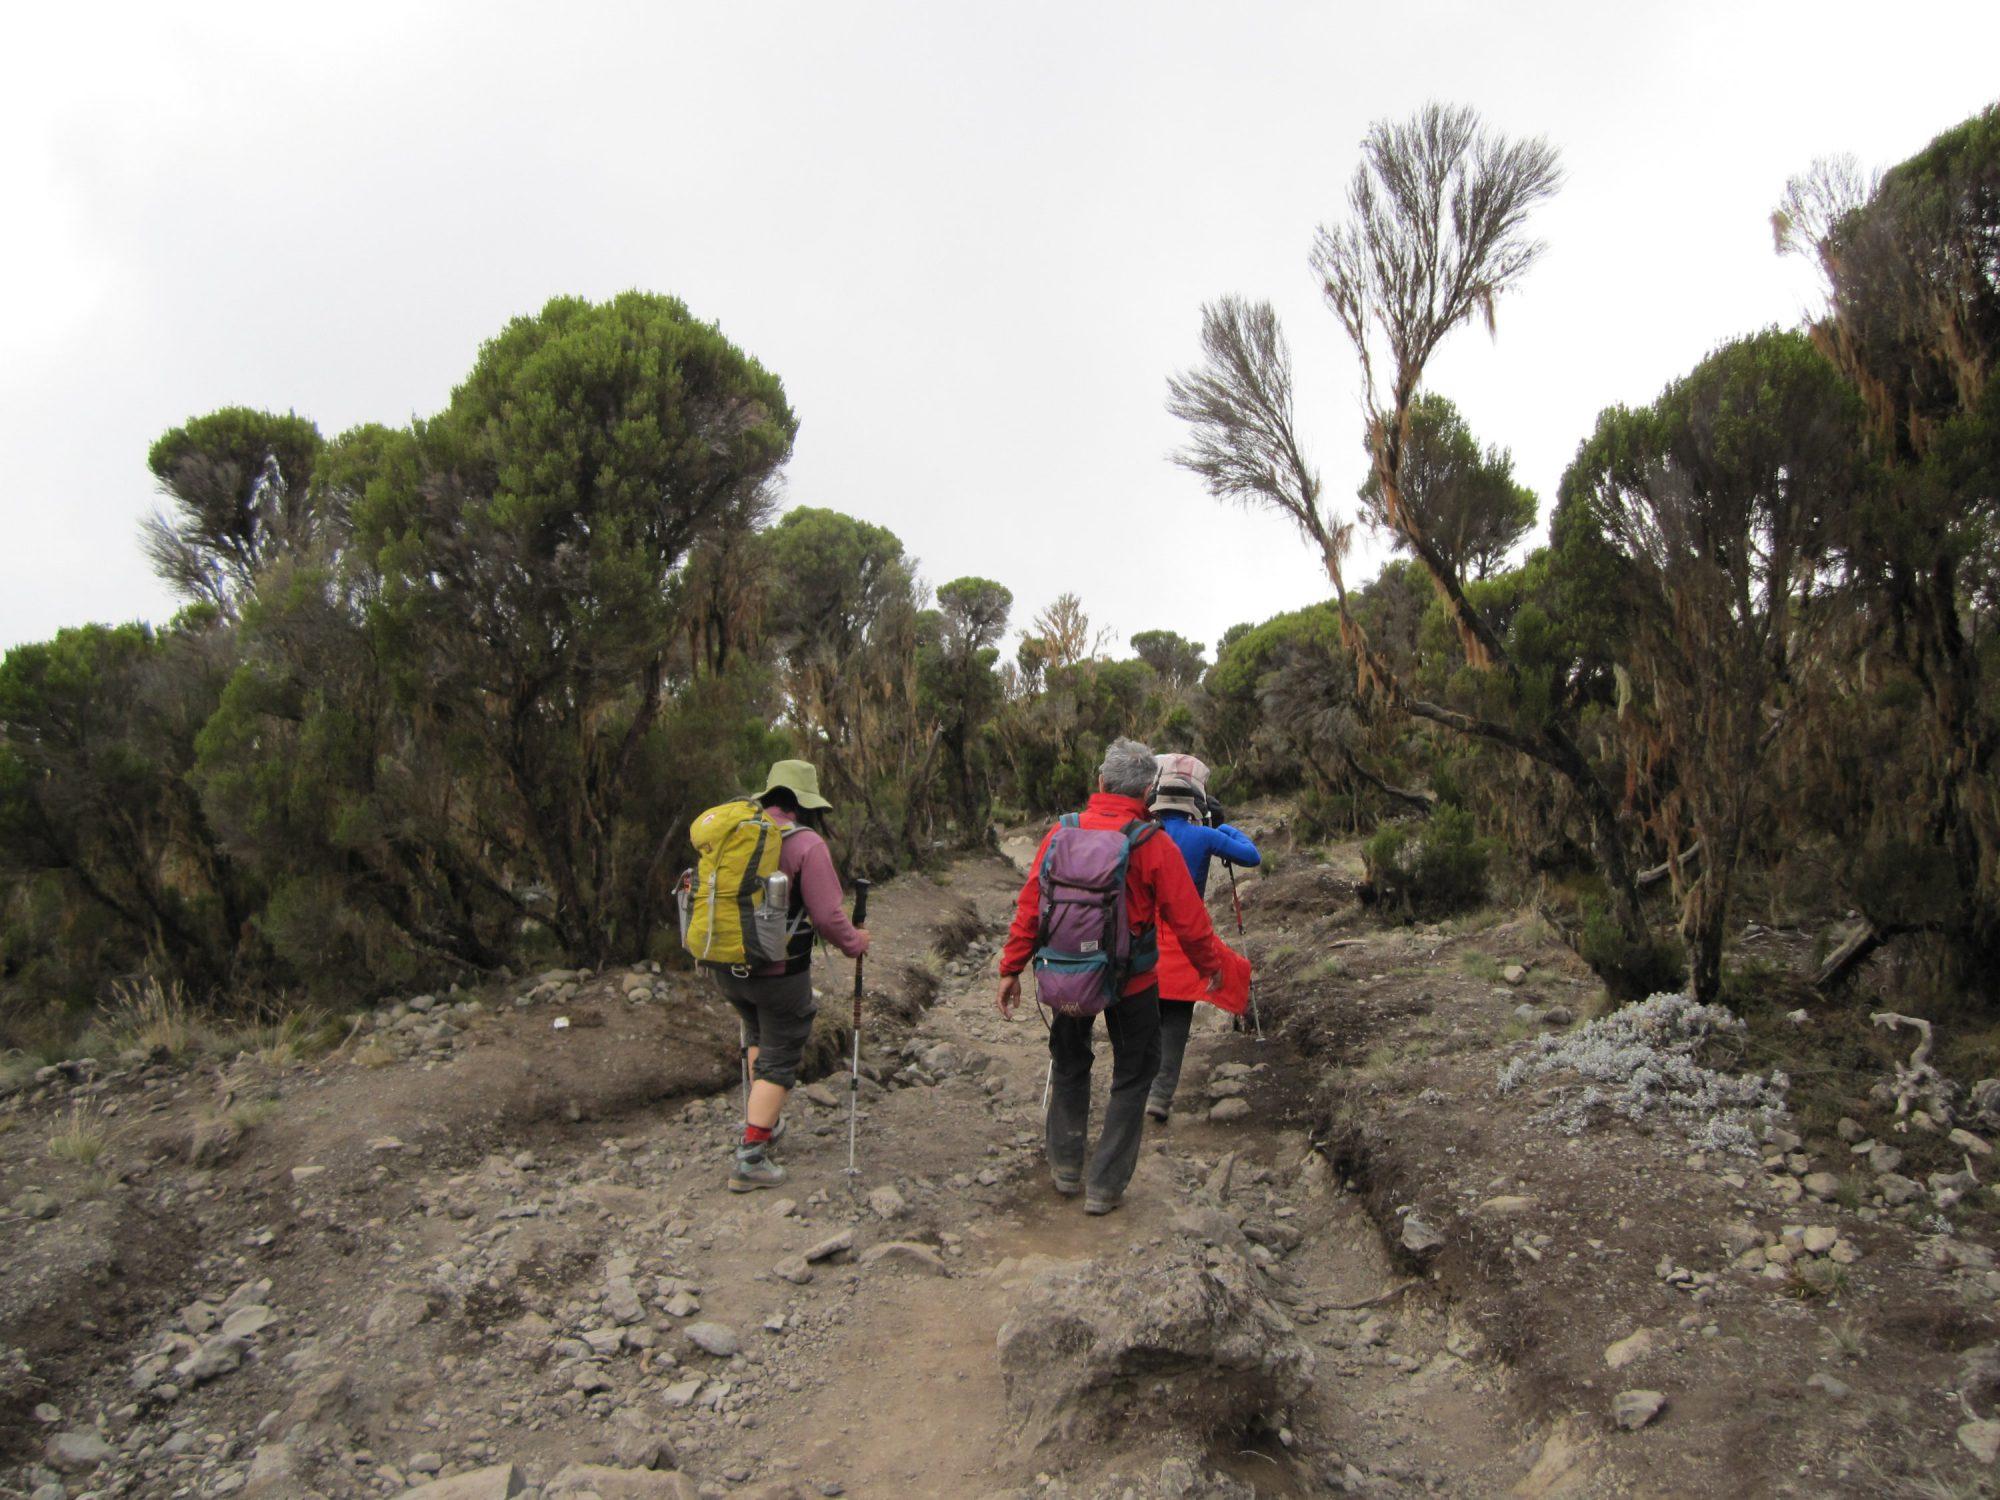 Flussbetten am Kilimandscharo, Kilimandscharo besteigen, Tansania, Afrika, Kilimandscharo Tour, Erfahrungsbericht, Machame Route